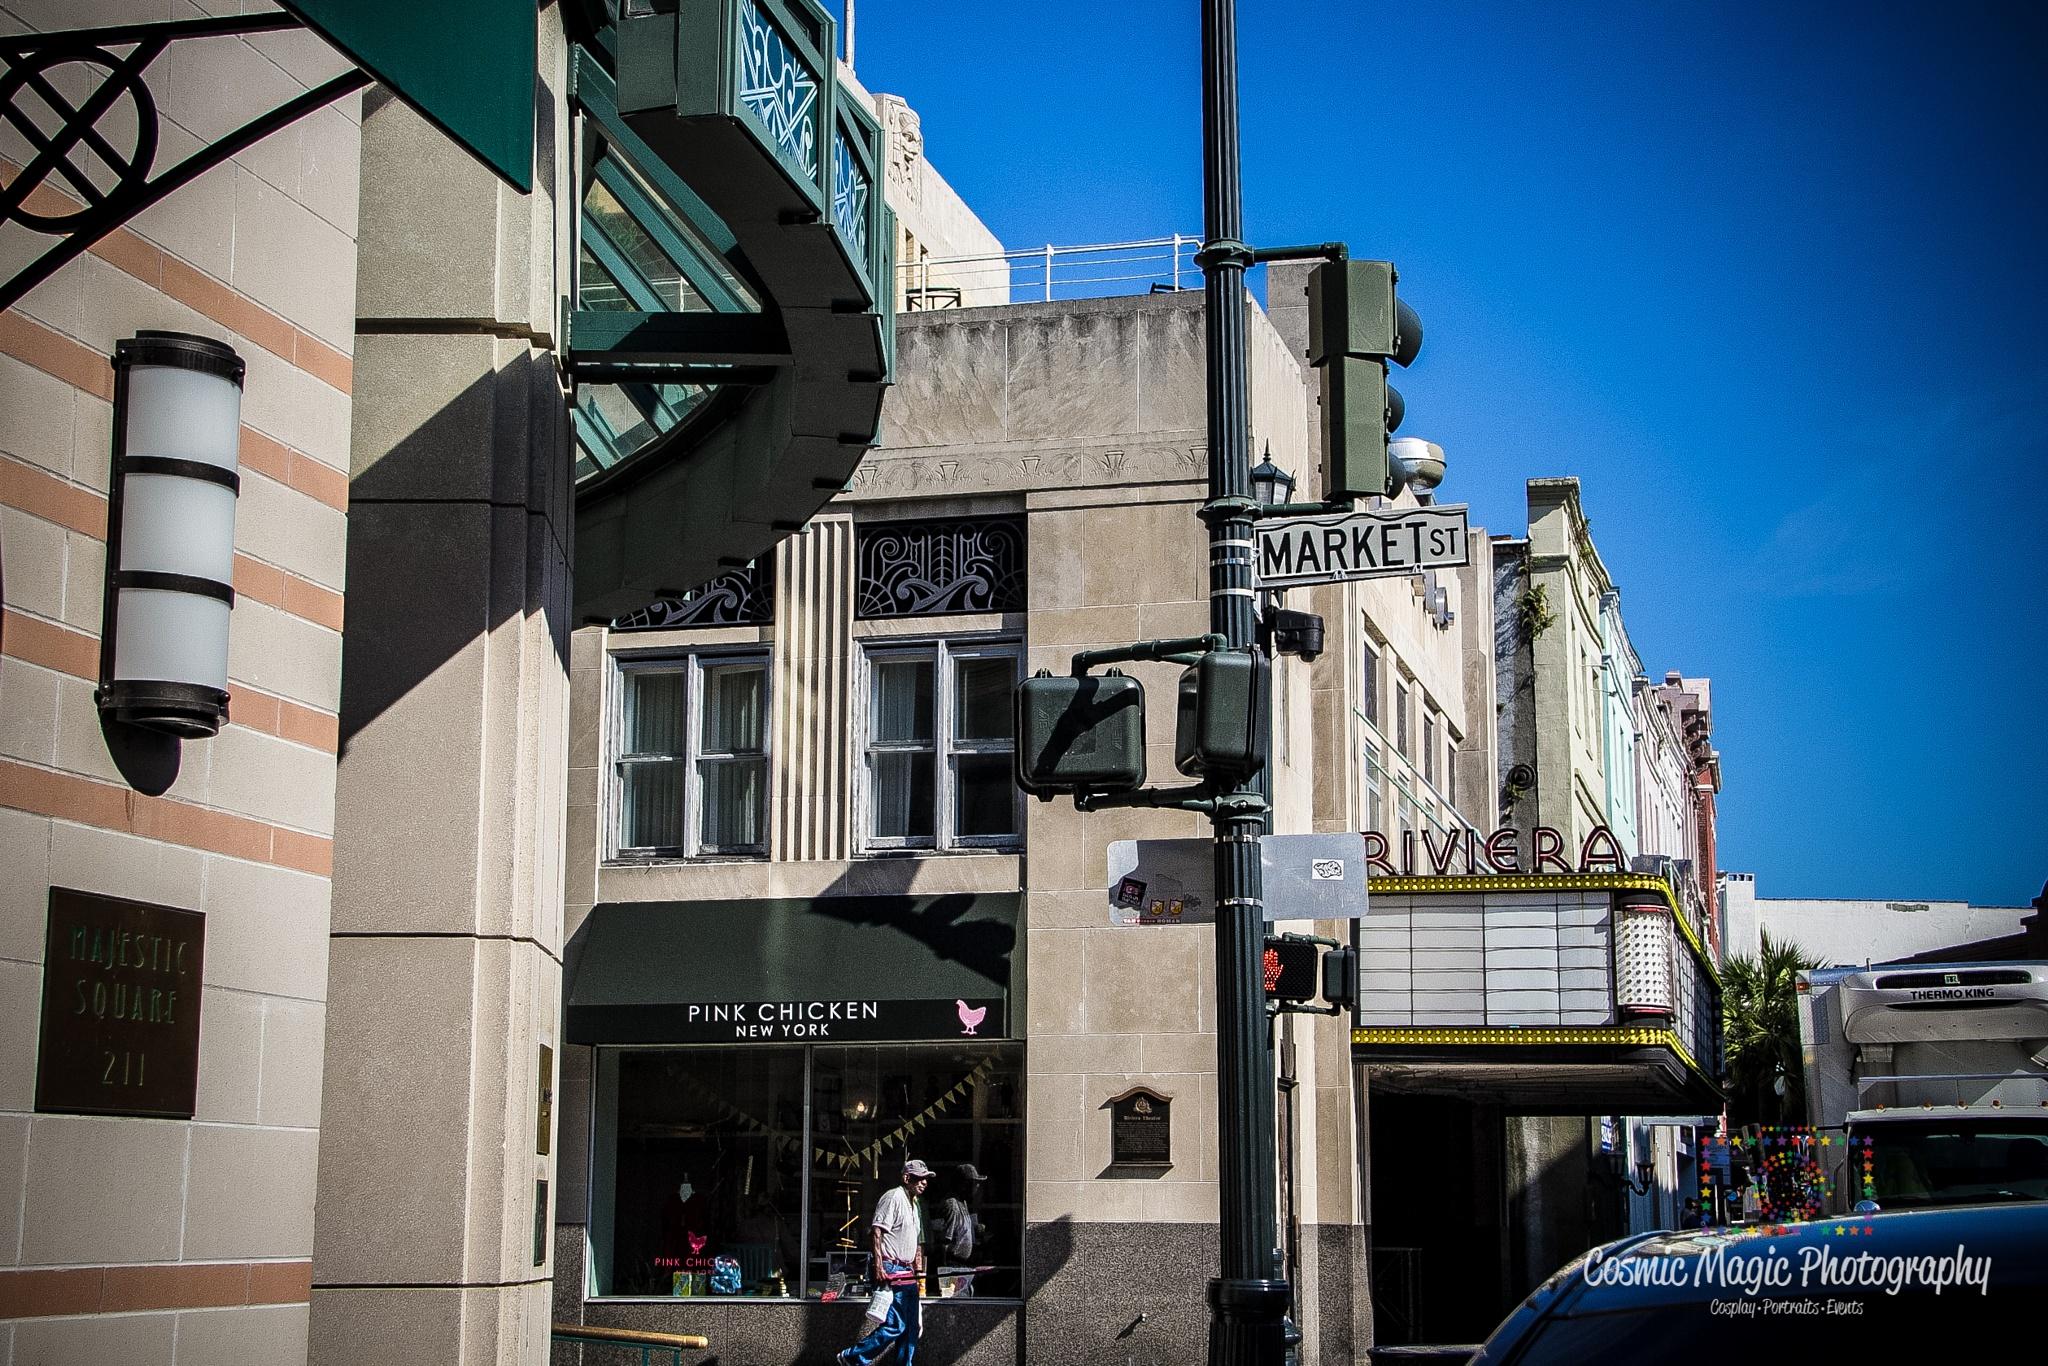 Charleston-South Carolina by Gina Adkins